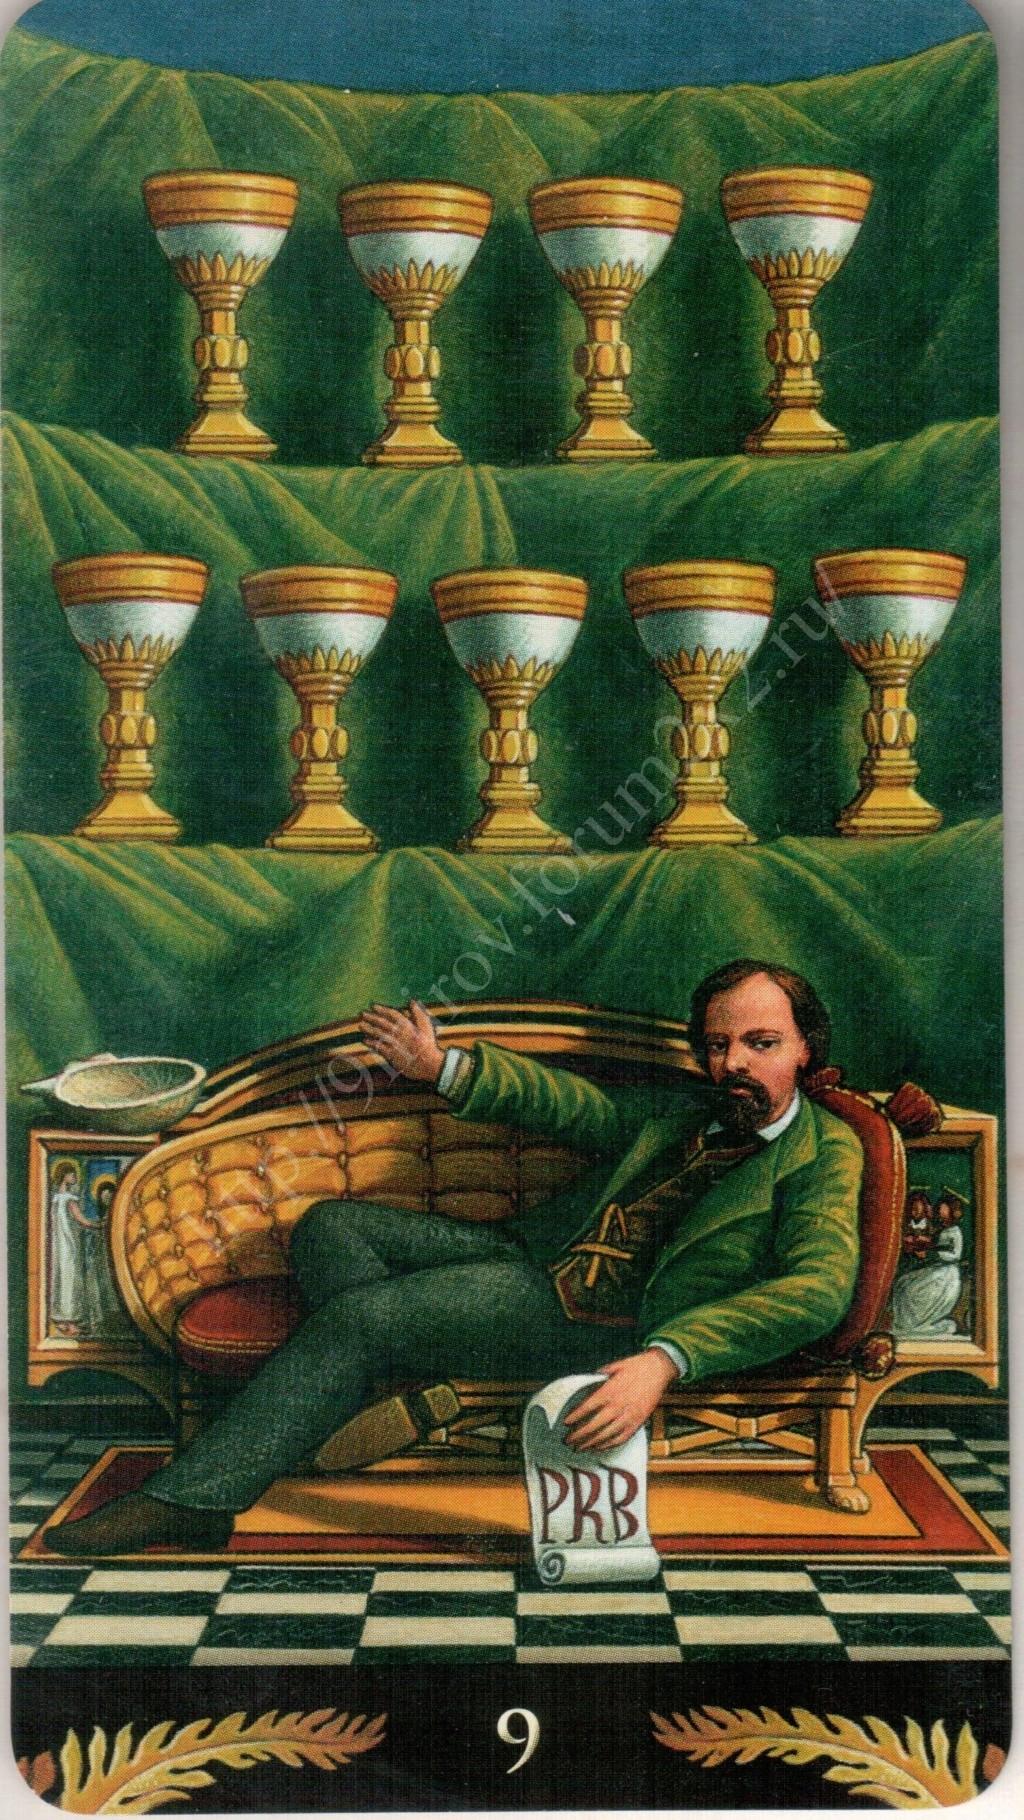 Таро Прерафаэлитов (Pre-Raphaelite Tarot) Галерея Water392